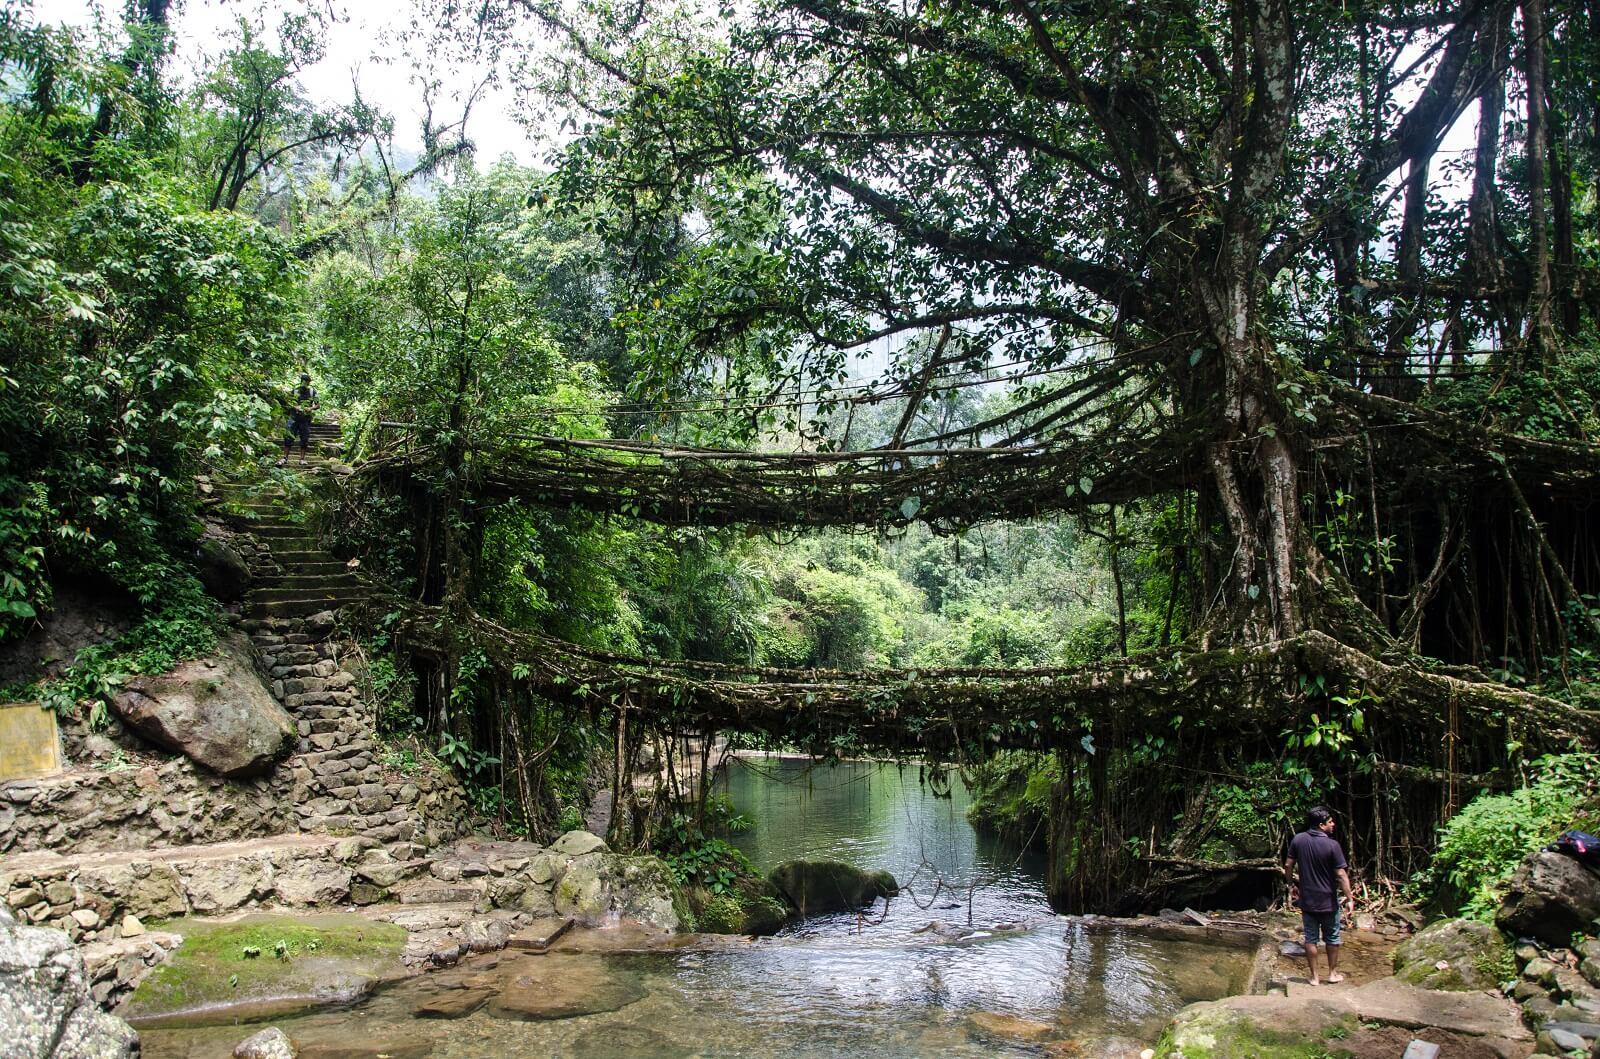 Living Bridge of Root, Meghalaya